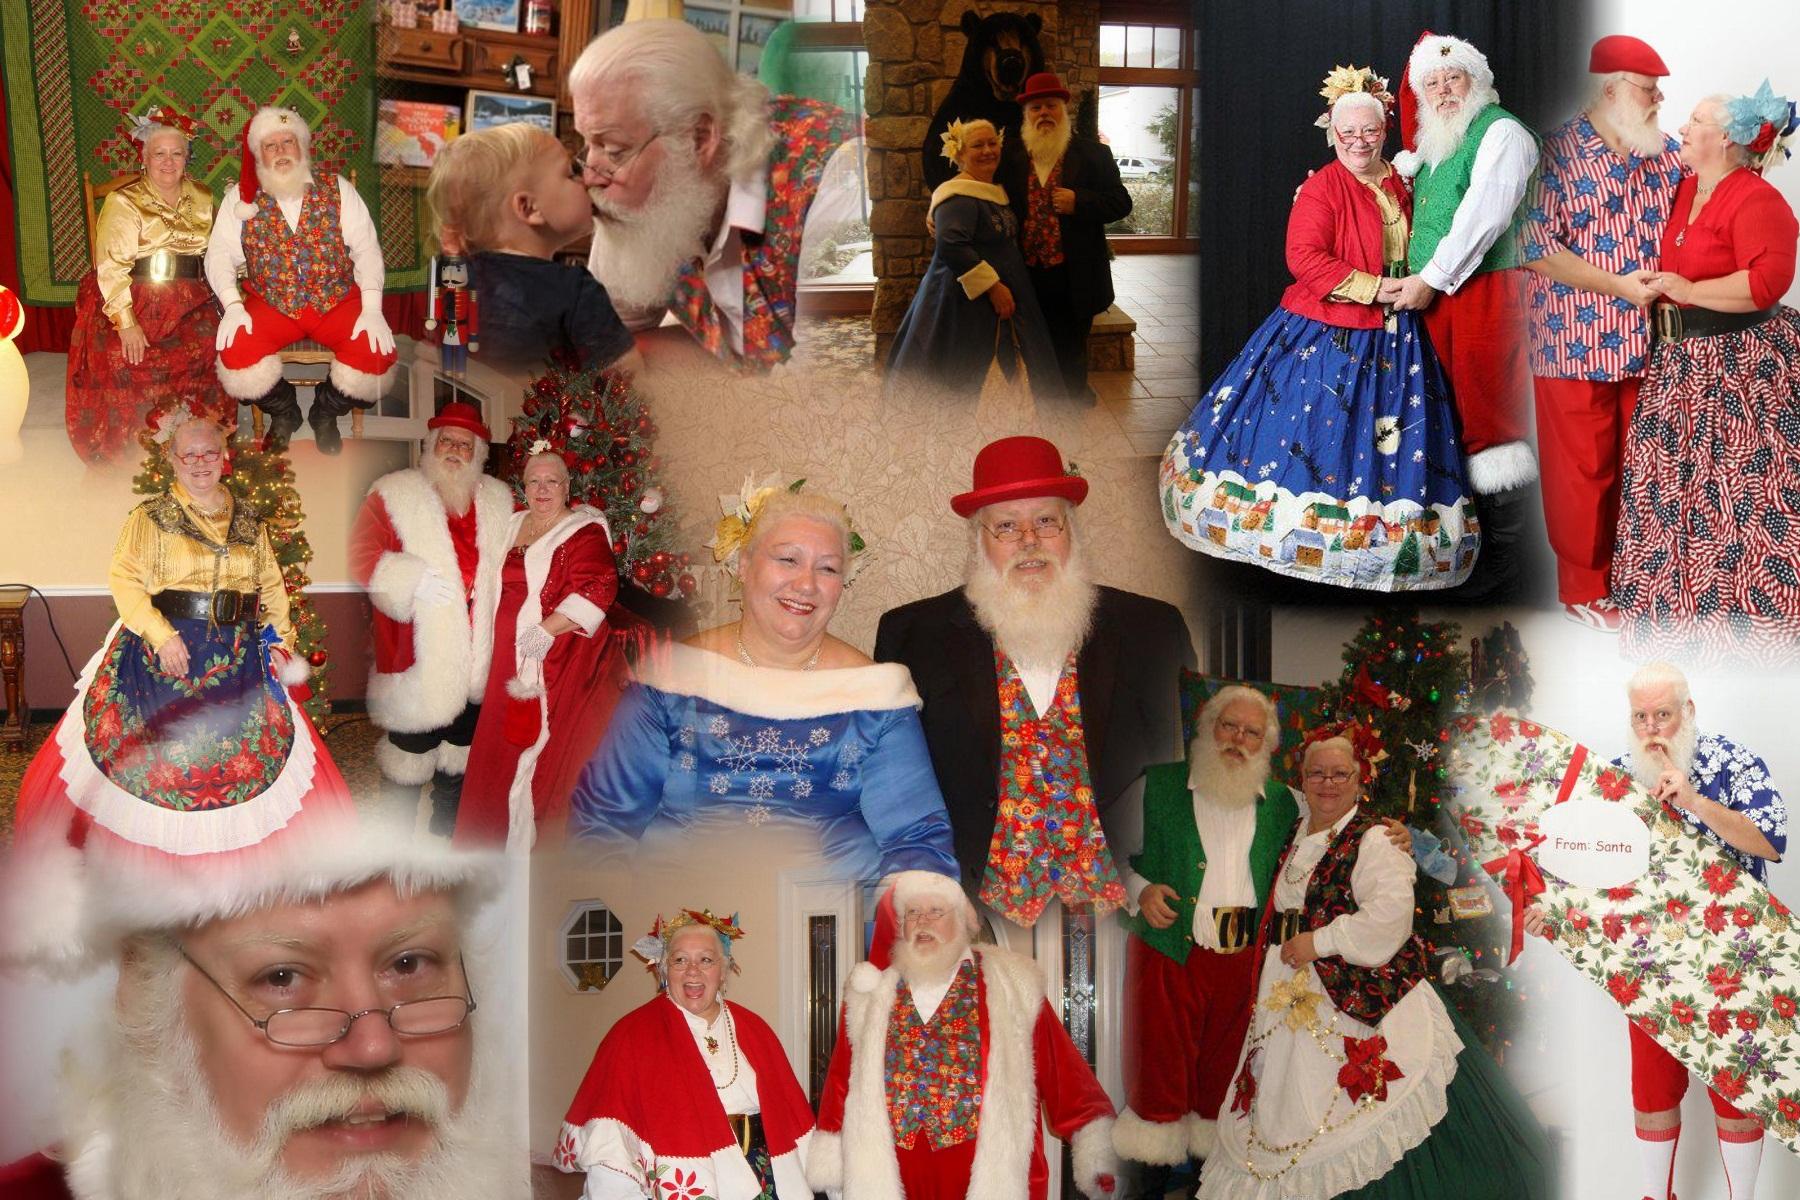 Mr. and Mrs. Santa Claus!